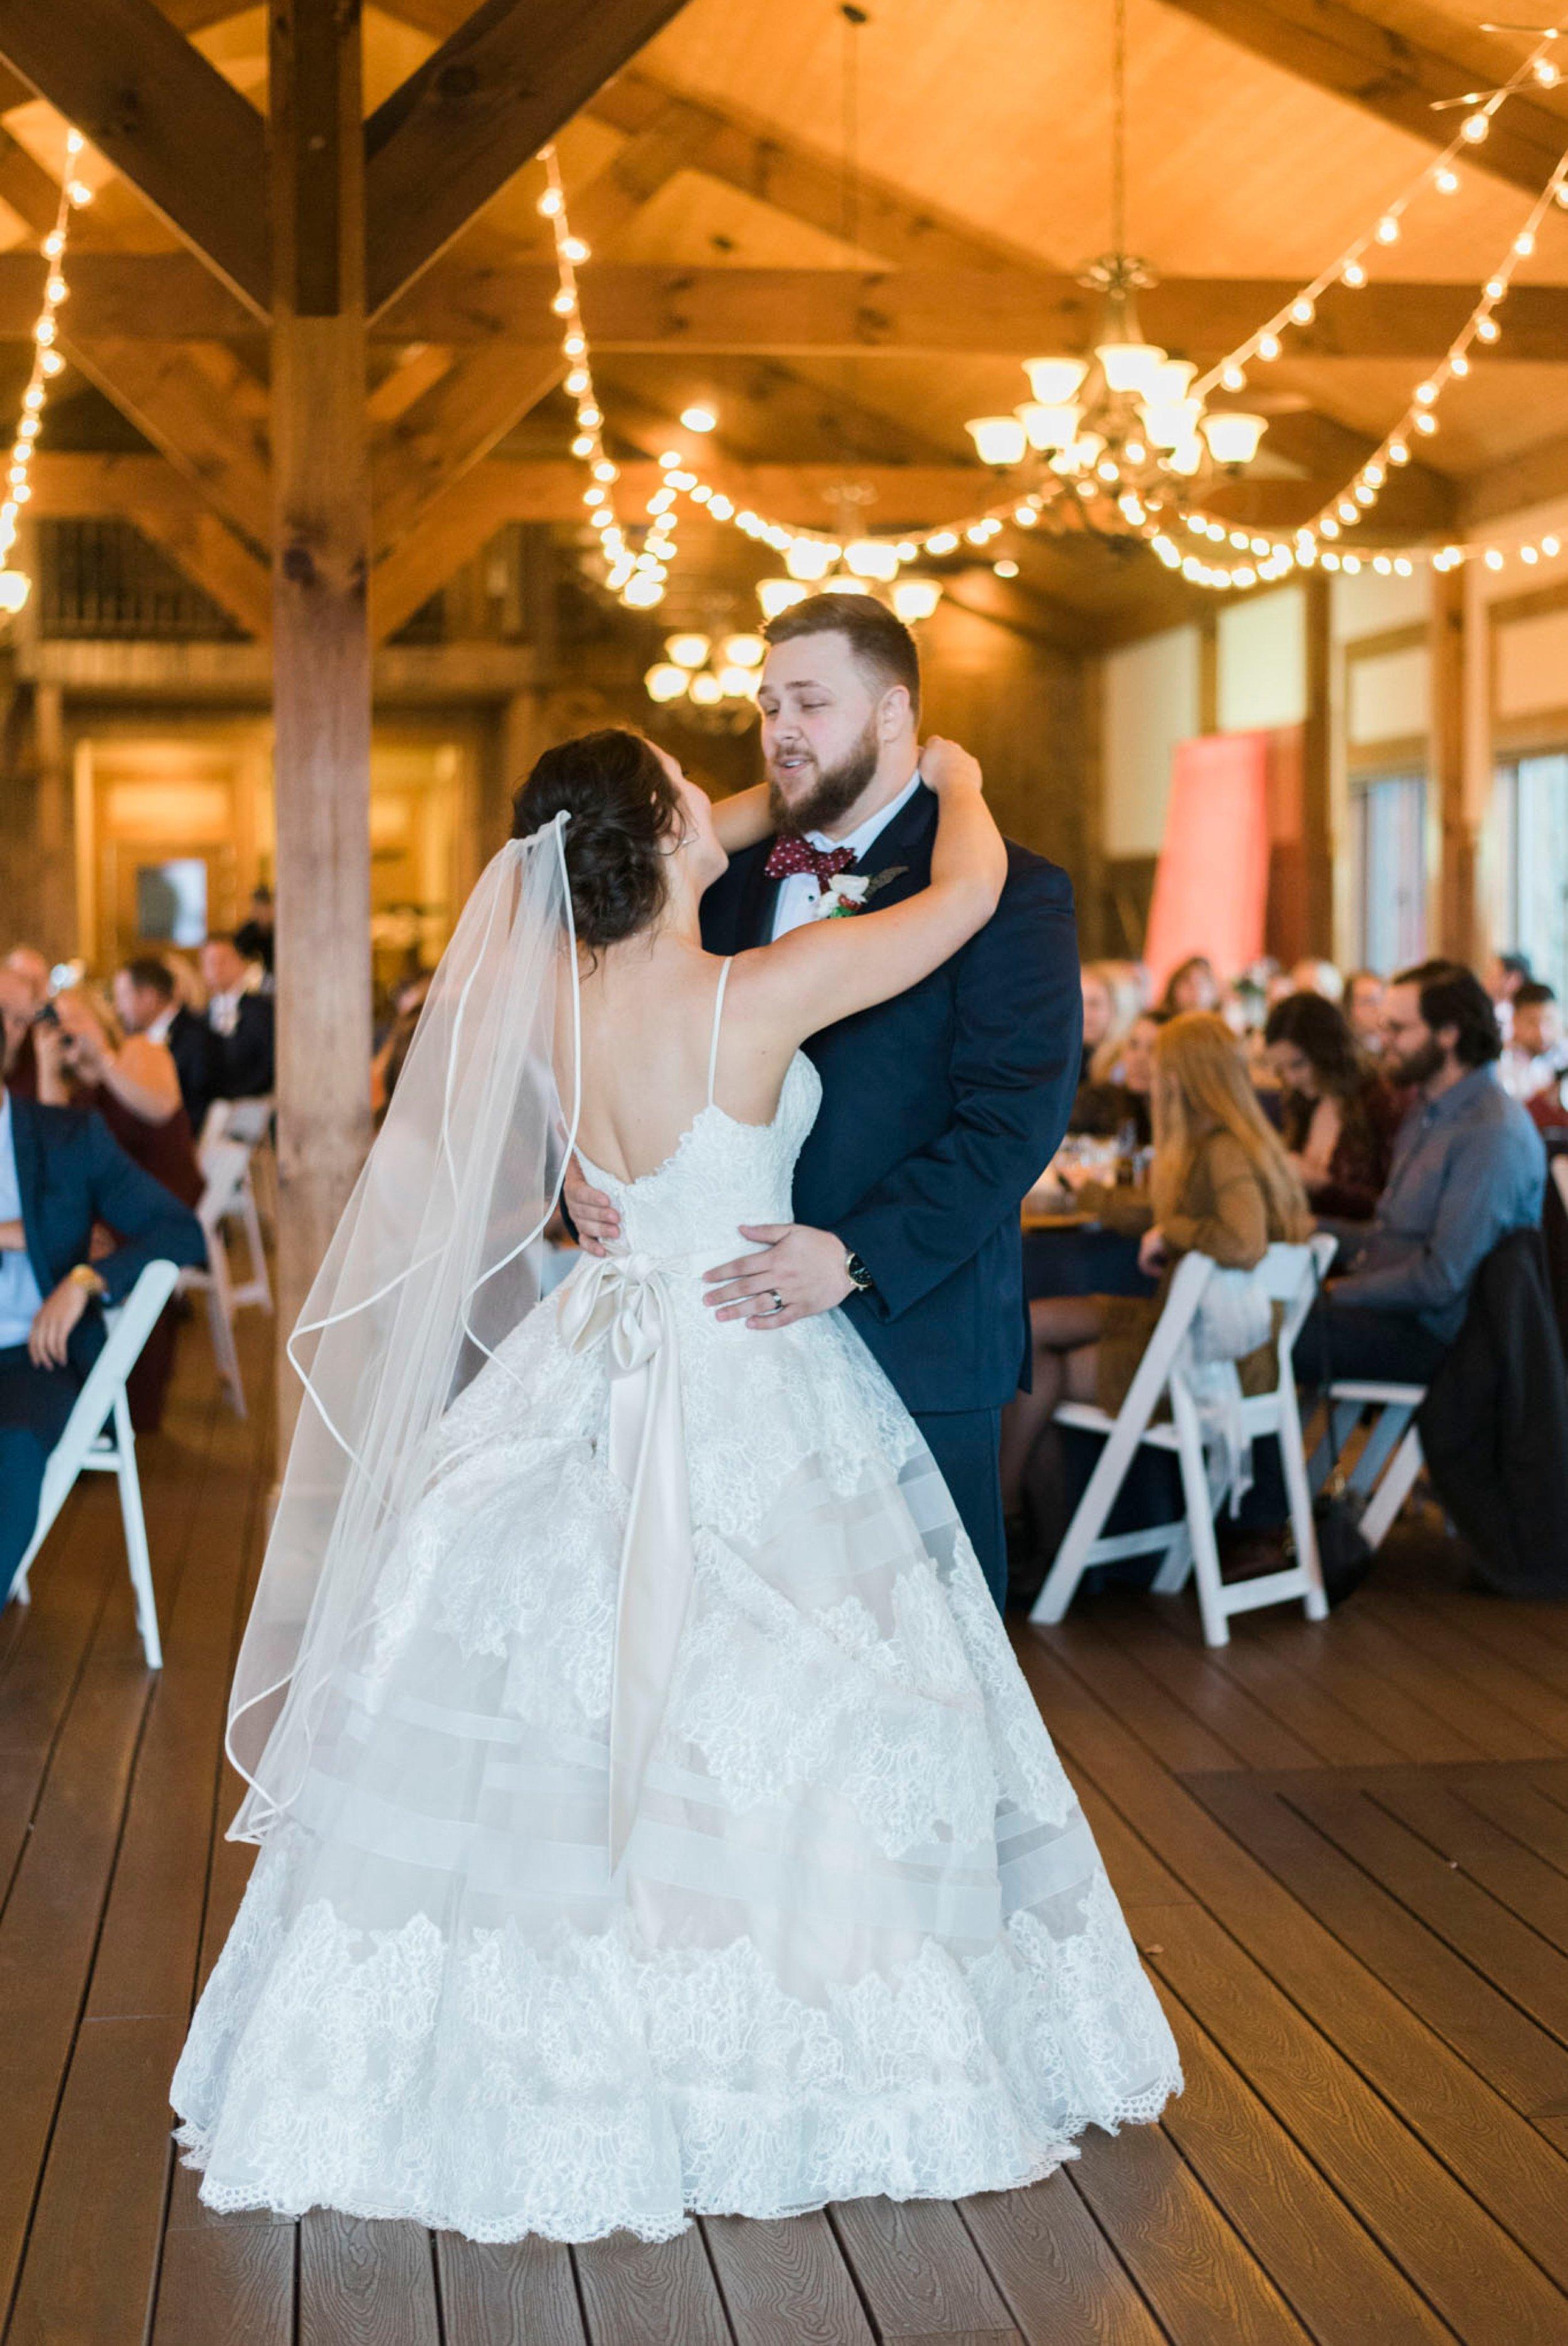 IrvineEstate_LexingtonVA_Wedding_FallWedding_VirginiaWeddingPhotographer 104.jpg